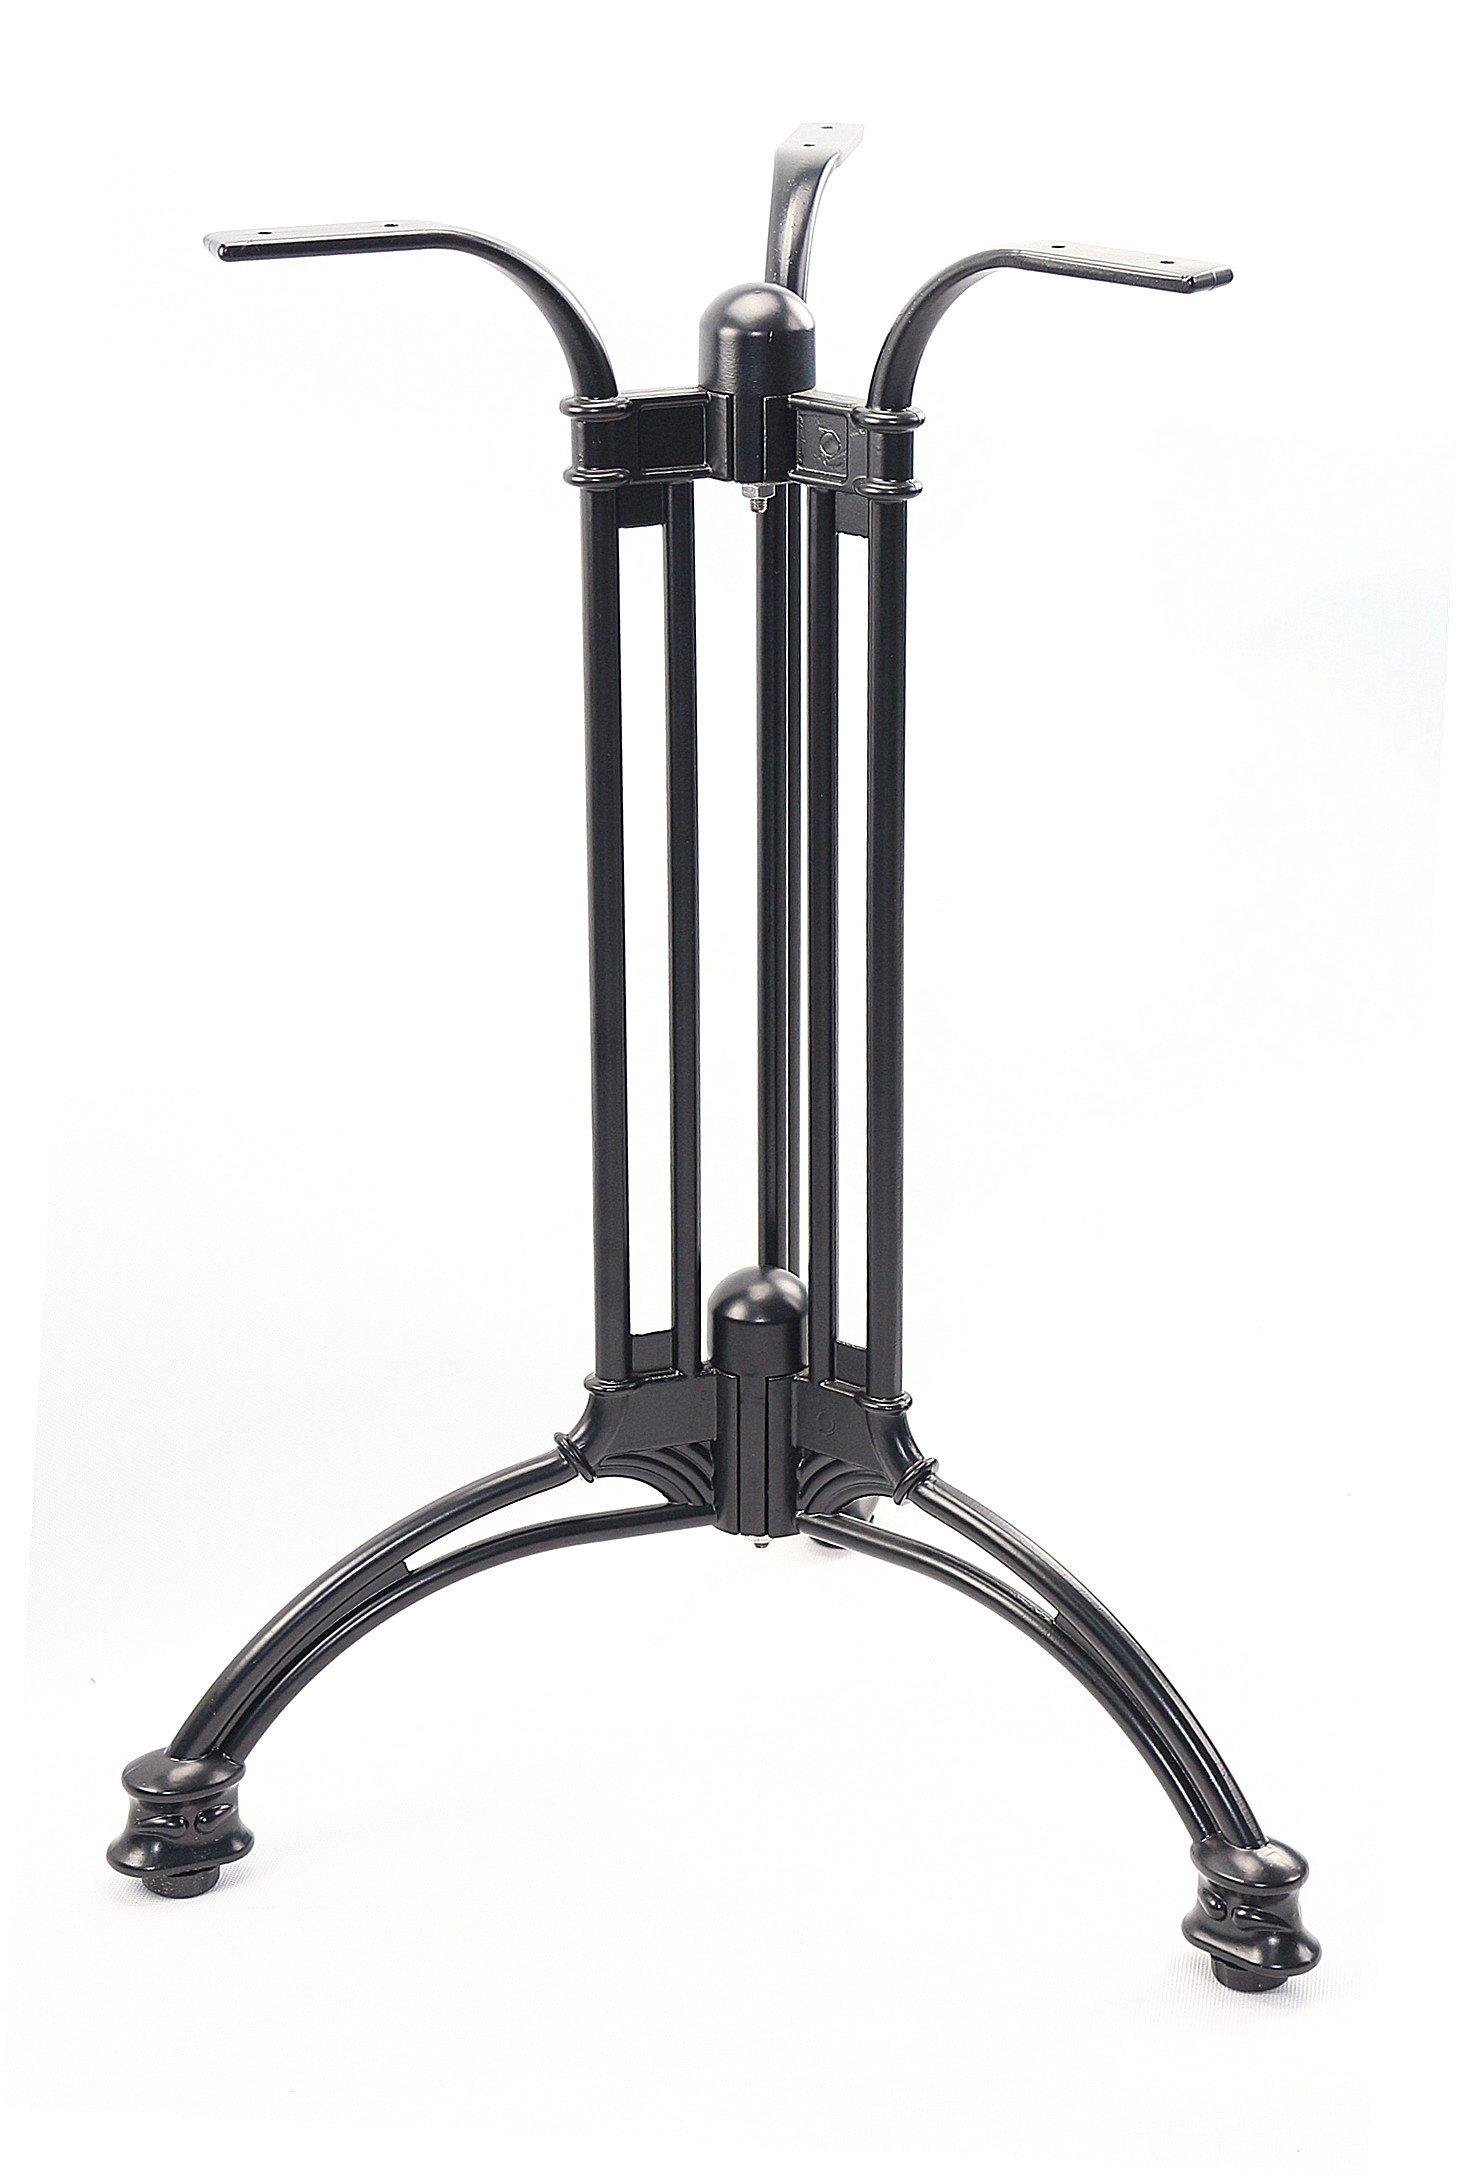 Mrhardware Cast Aluminum Table Leg Table Base Oining Black(3-LEGS)